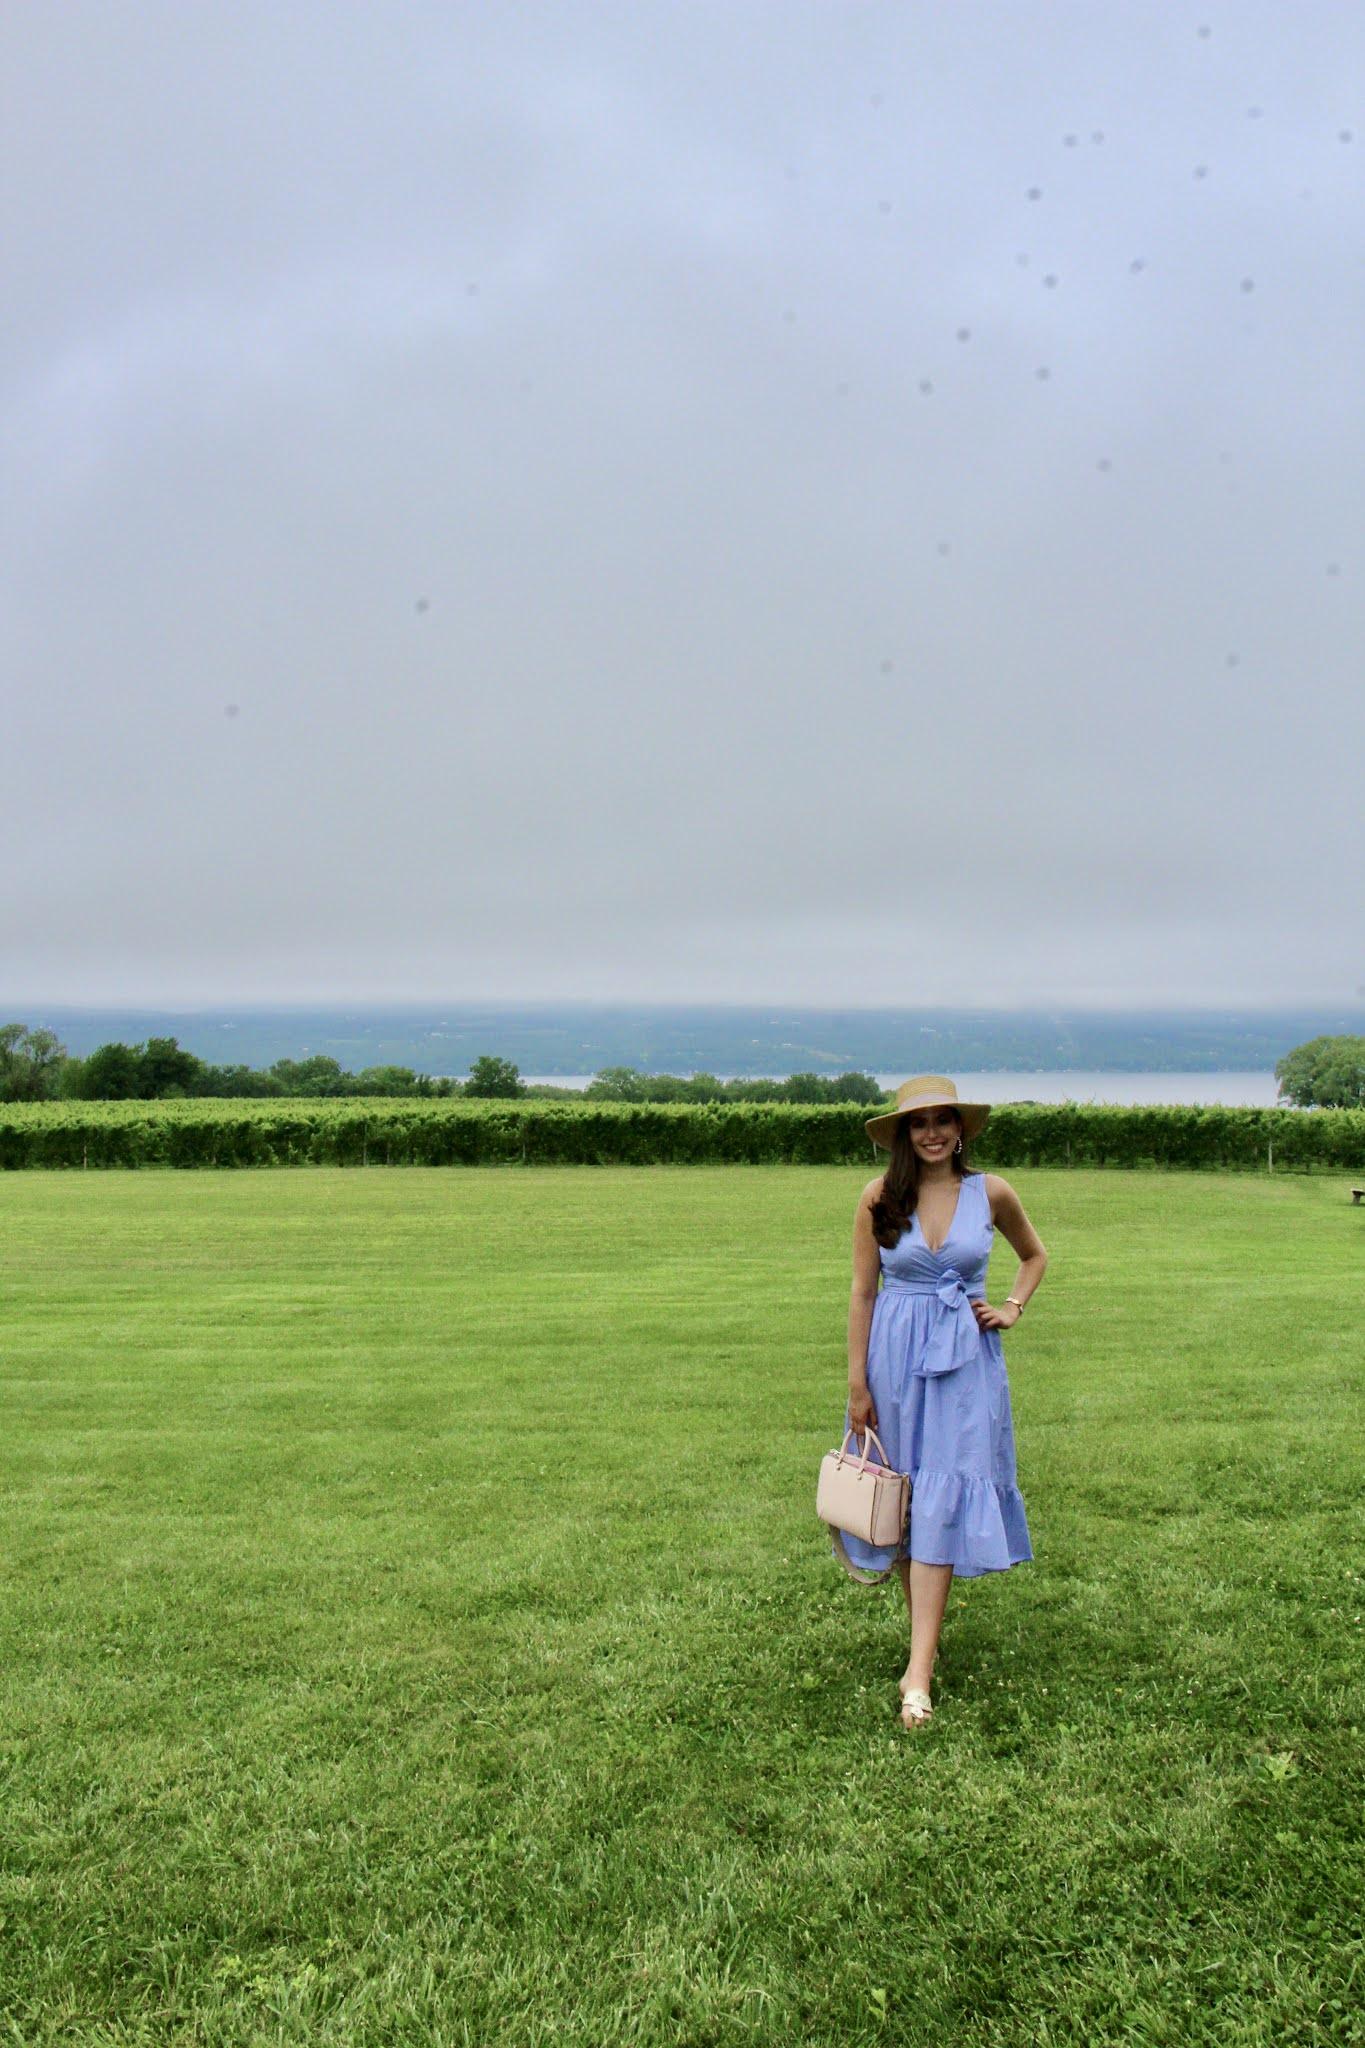 upstate new york, travel, explore, winery, vineyard, straw hat, maxi dress